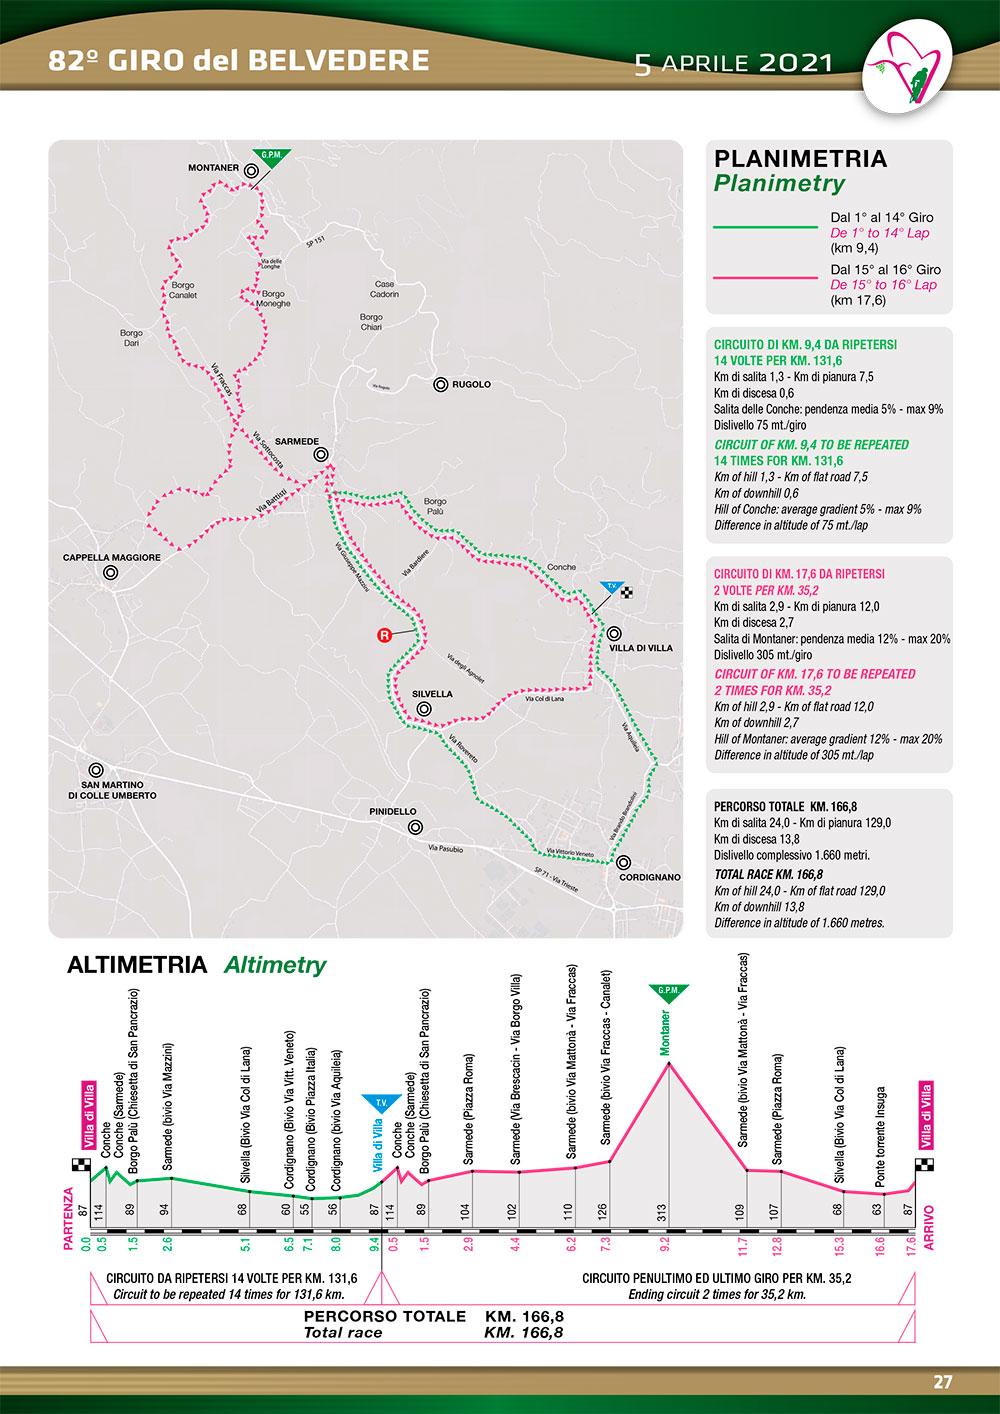 Giro del Belvedere - Planimetria e Altimetria